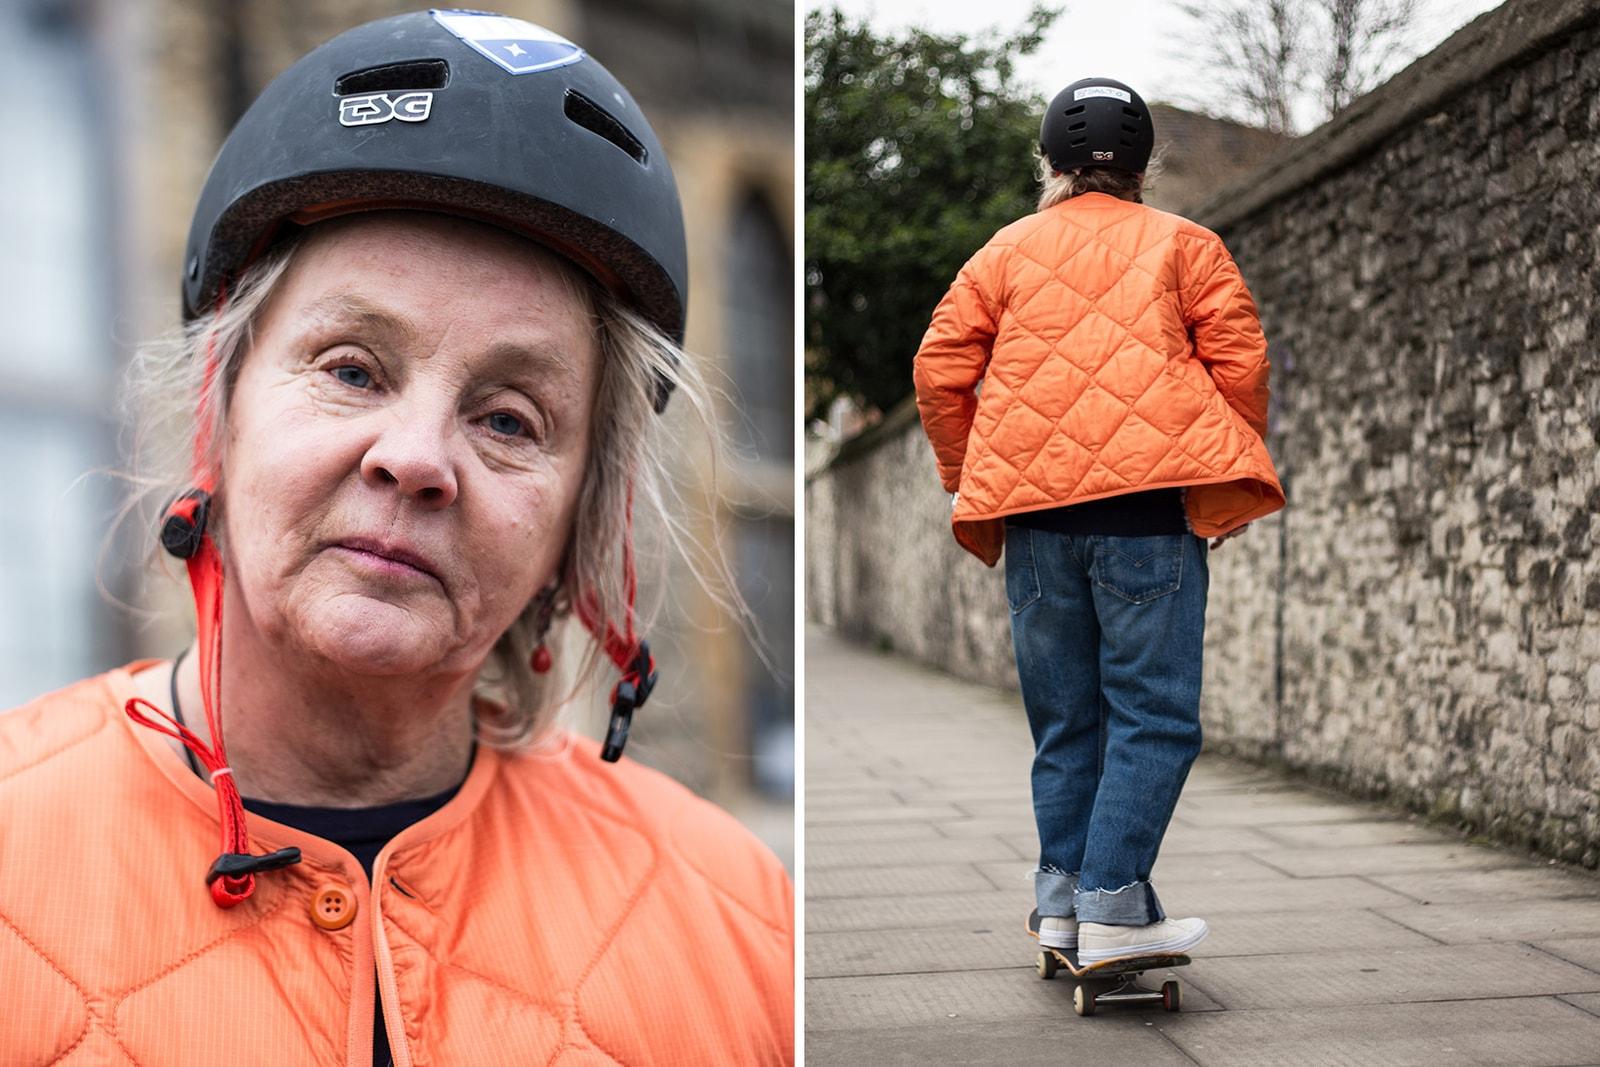 lena salmi very old skateboarders elderly skater skateboarder finland helsinki facebook group interview editorial